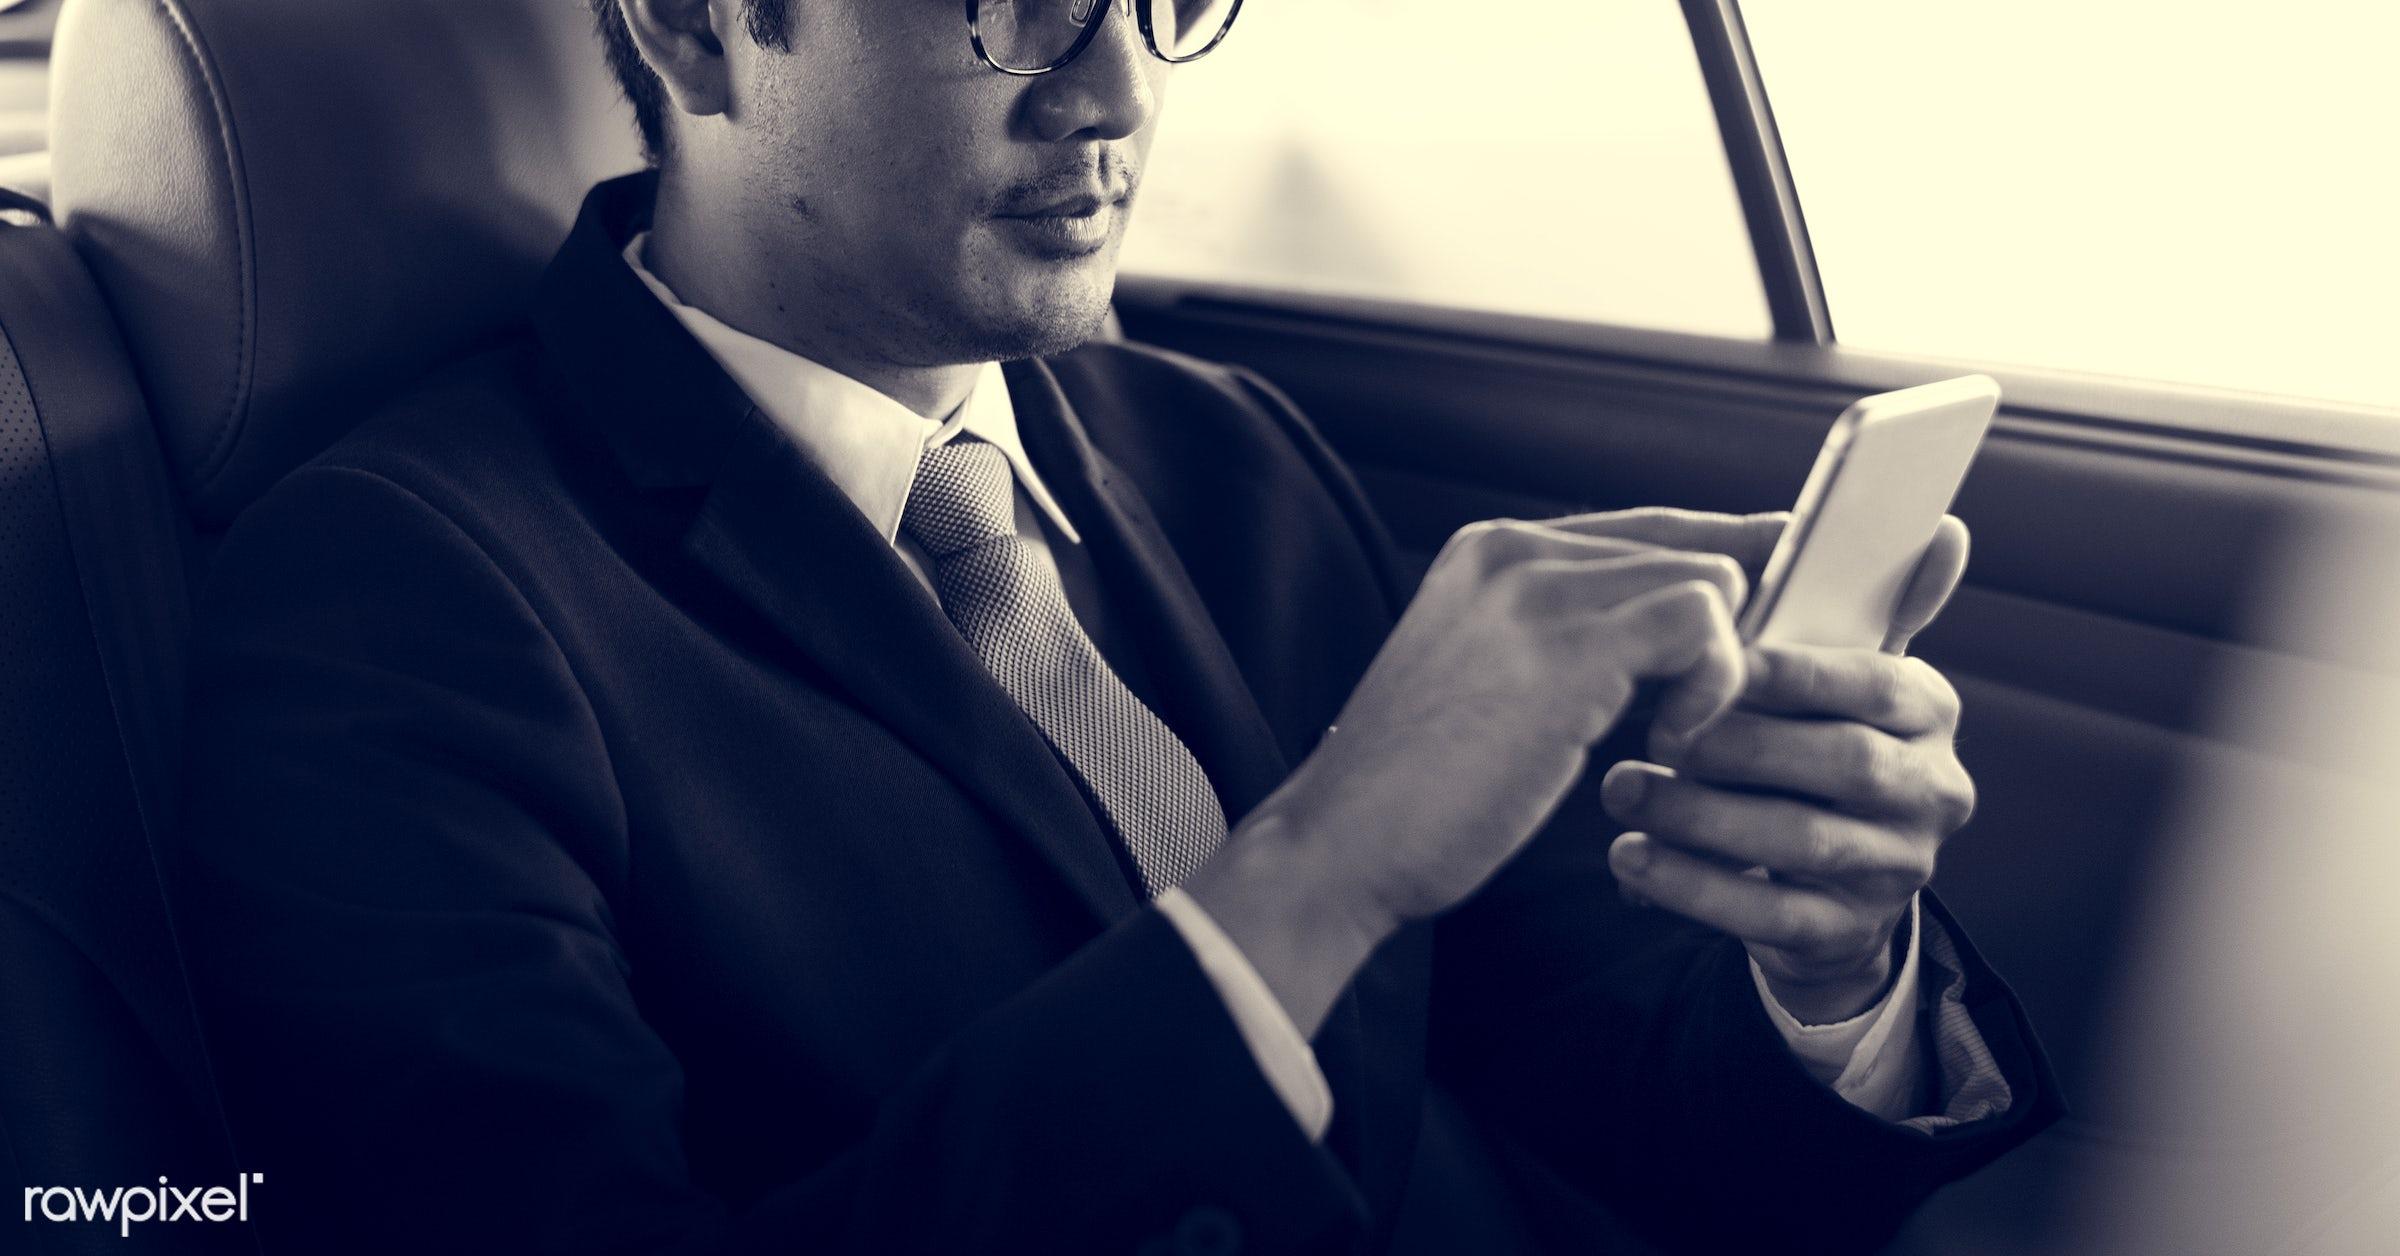 adult, business, businessman, businessmen, candid, car, cellphone, communication, corporate, device, digital device,...